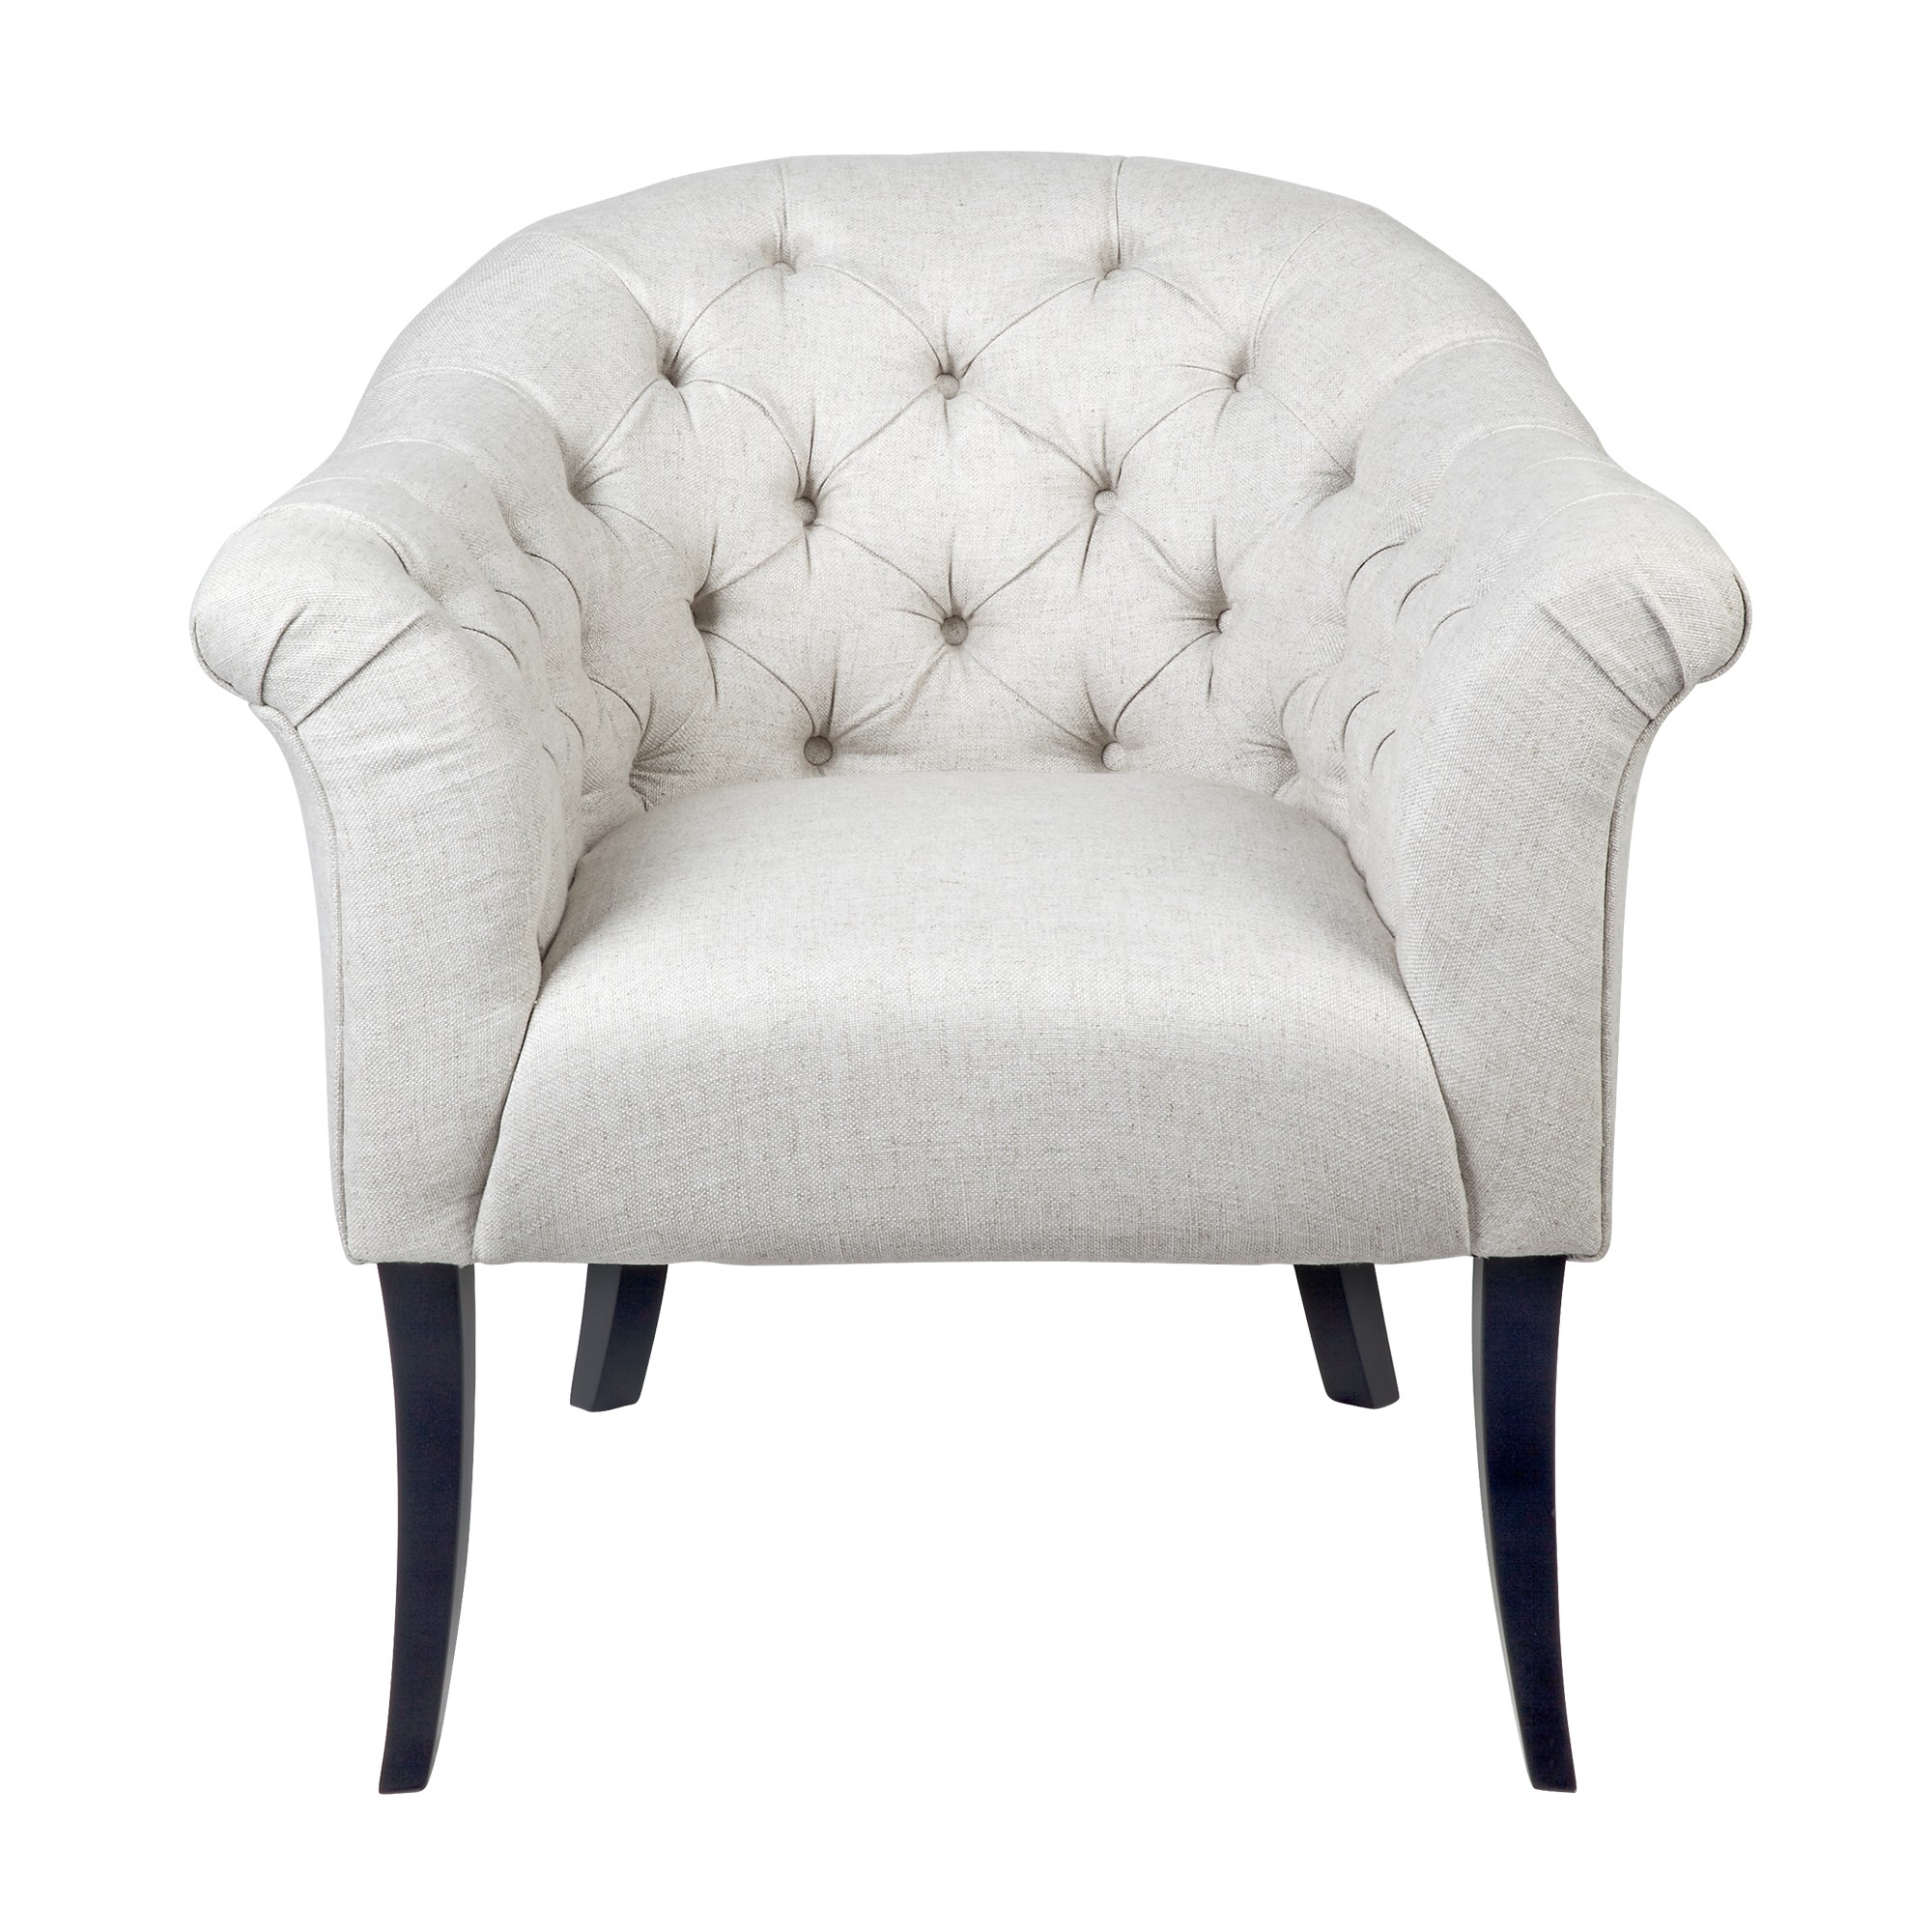 Georgina Tufted Fabric Armchair, Oatmeal Throughout Georgina Armchairs (Set Of 2) (View 3 of 15)